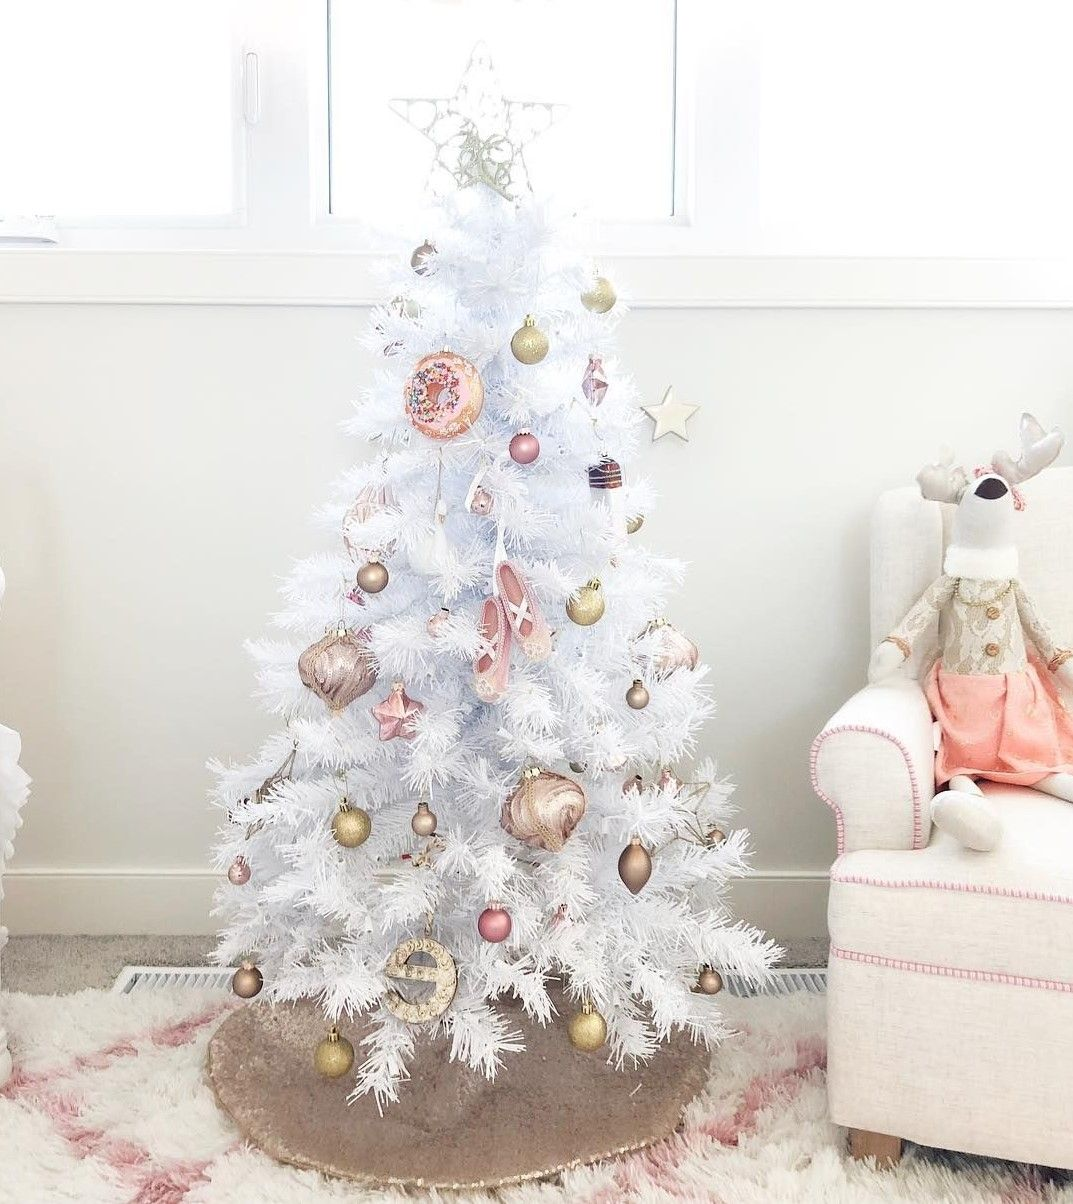 100 Options Incroyables De Deco De Noel Gifi A Bas Prix Deco De Fete Decoration De Noel Zenidees Decoration Noel Deco Noel Decoration